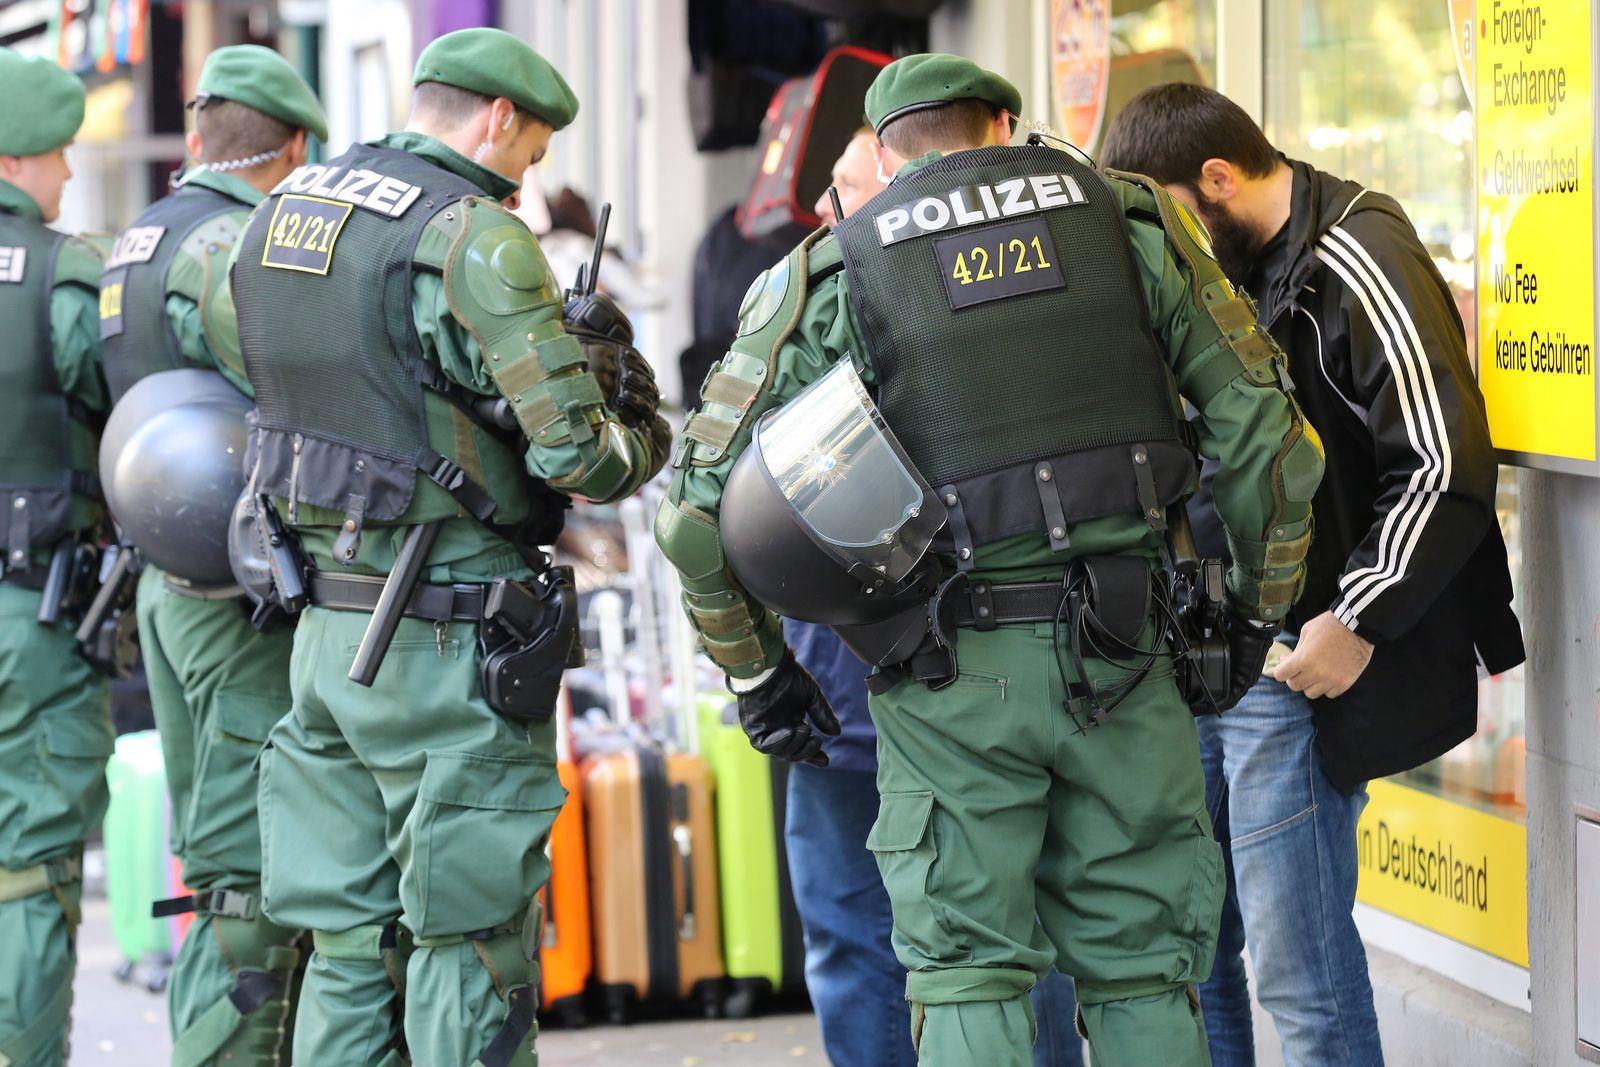 Polizei kontrolliert Muslime